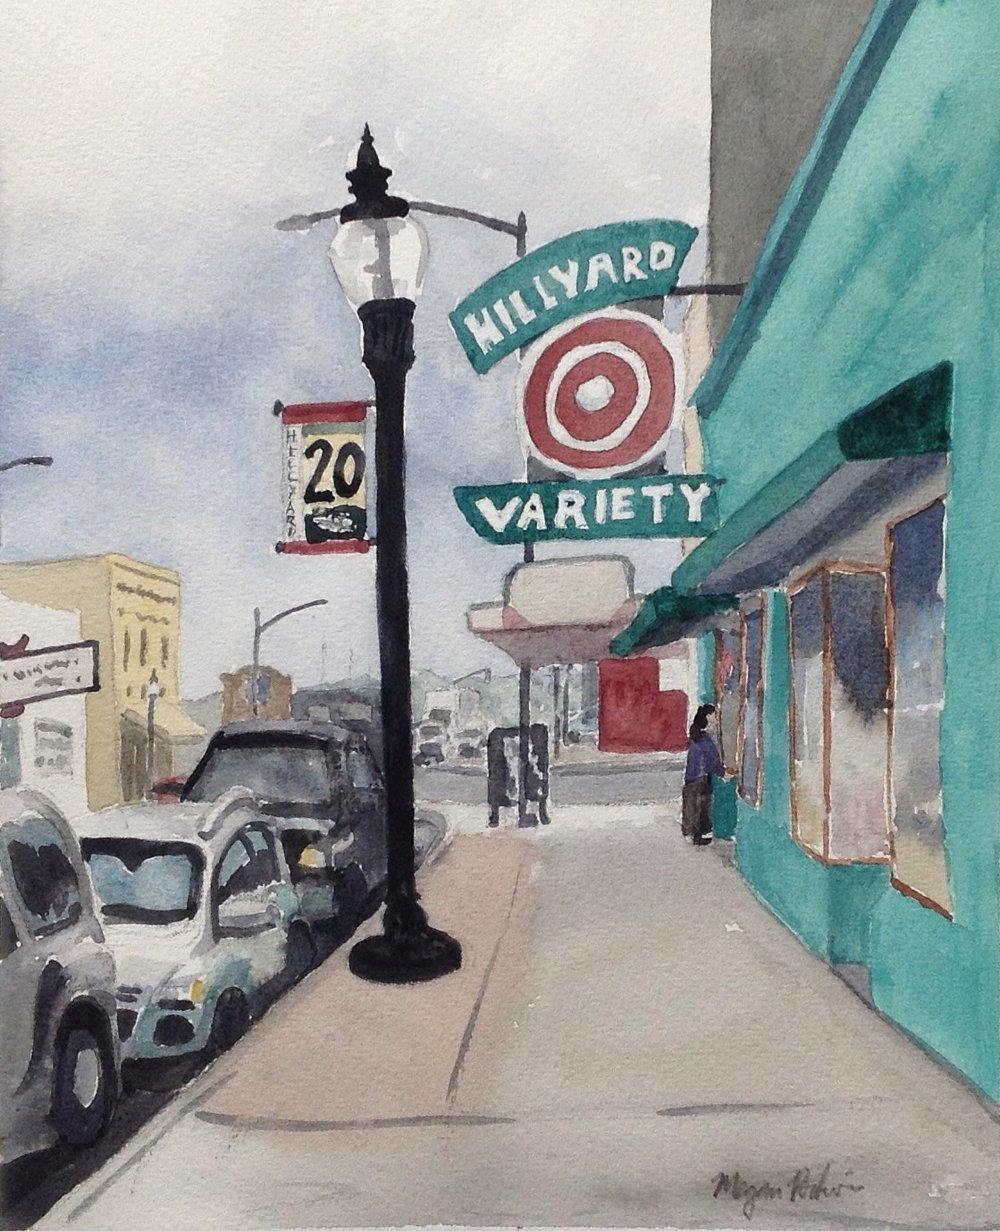 painting_HillyardBullseye_cropped_midres.JPG